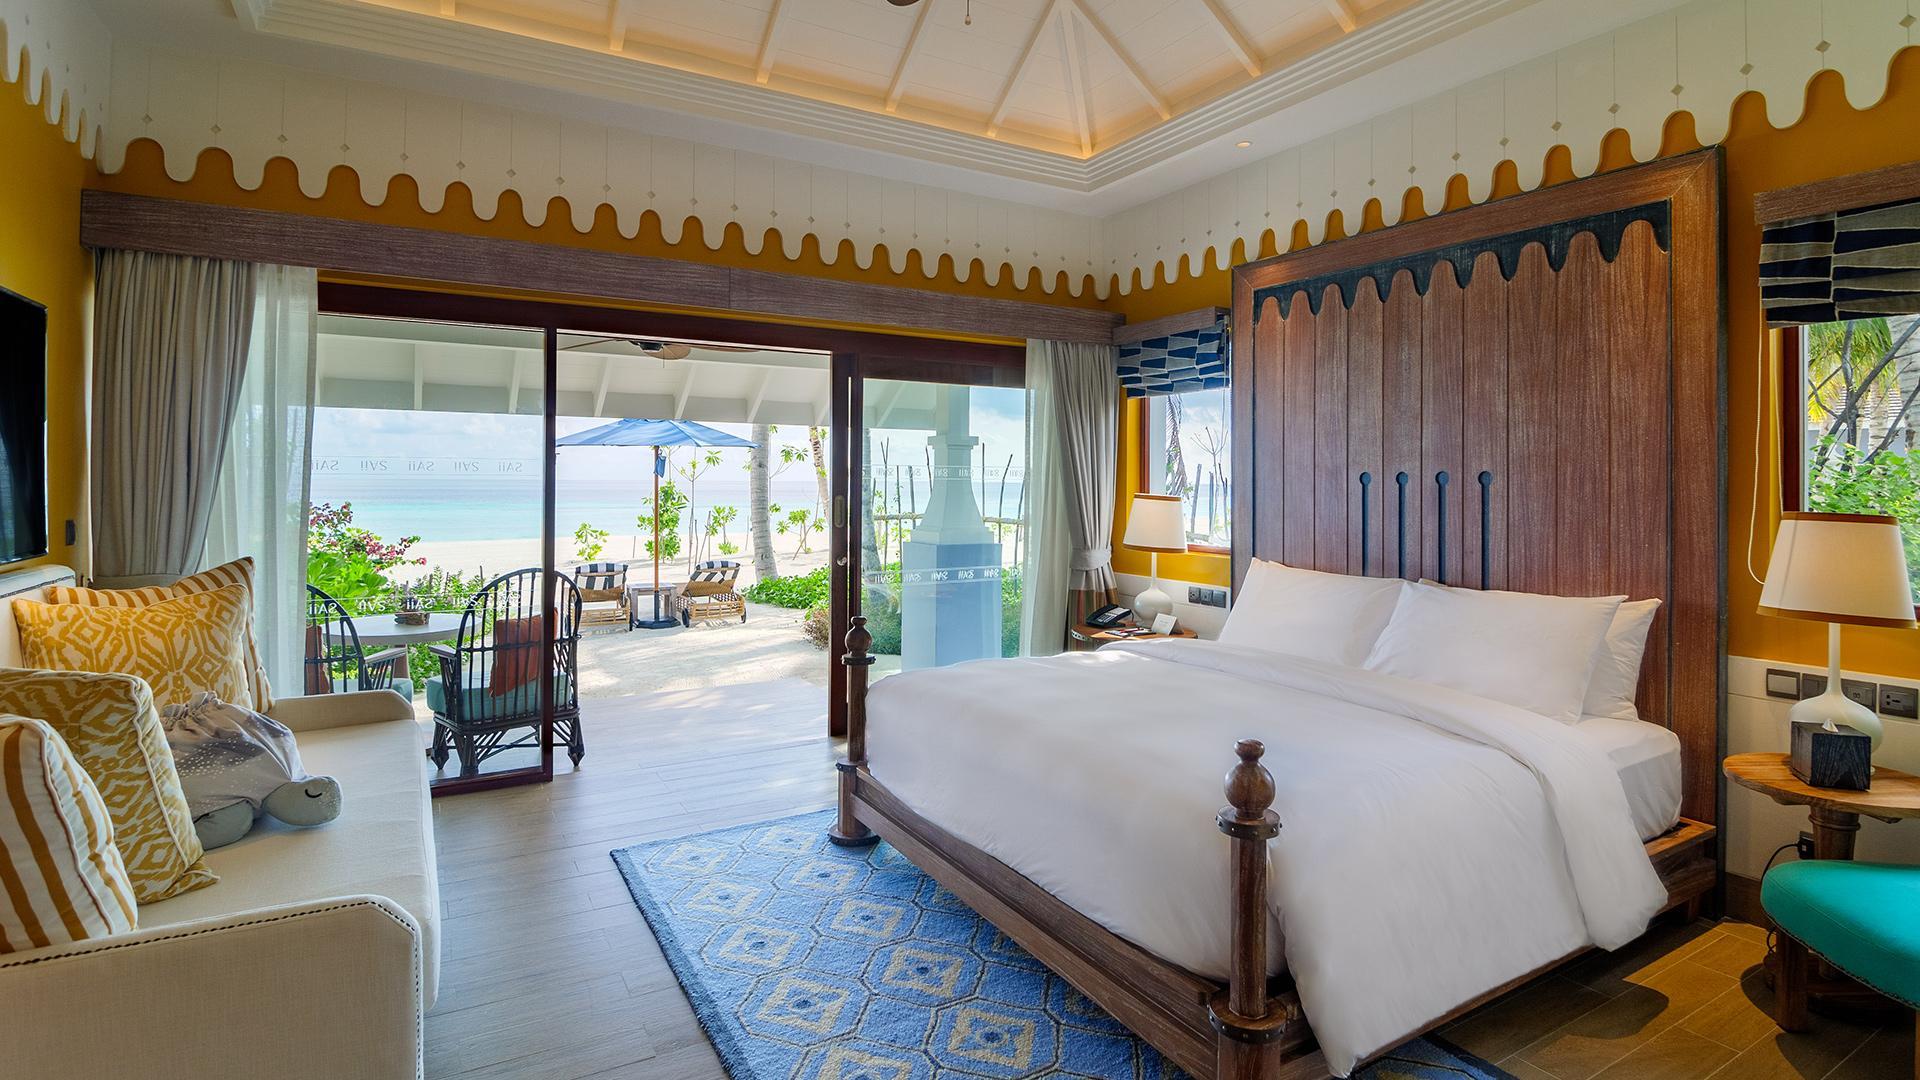 Beach Villa  image 1 at SAii Lagoon Maldives, Curio Collection by Hilton by Kaafu Atoll, North Central Province, Maldives